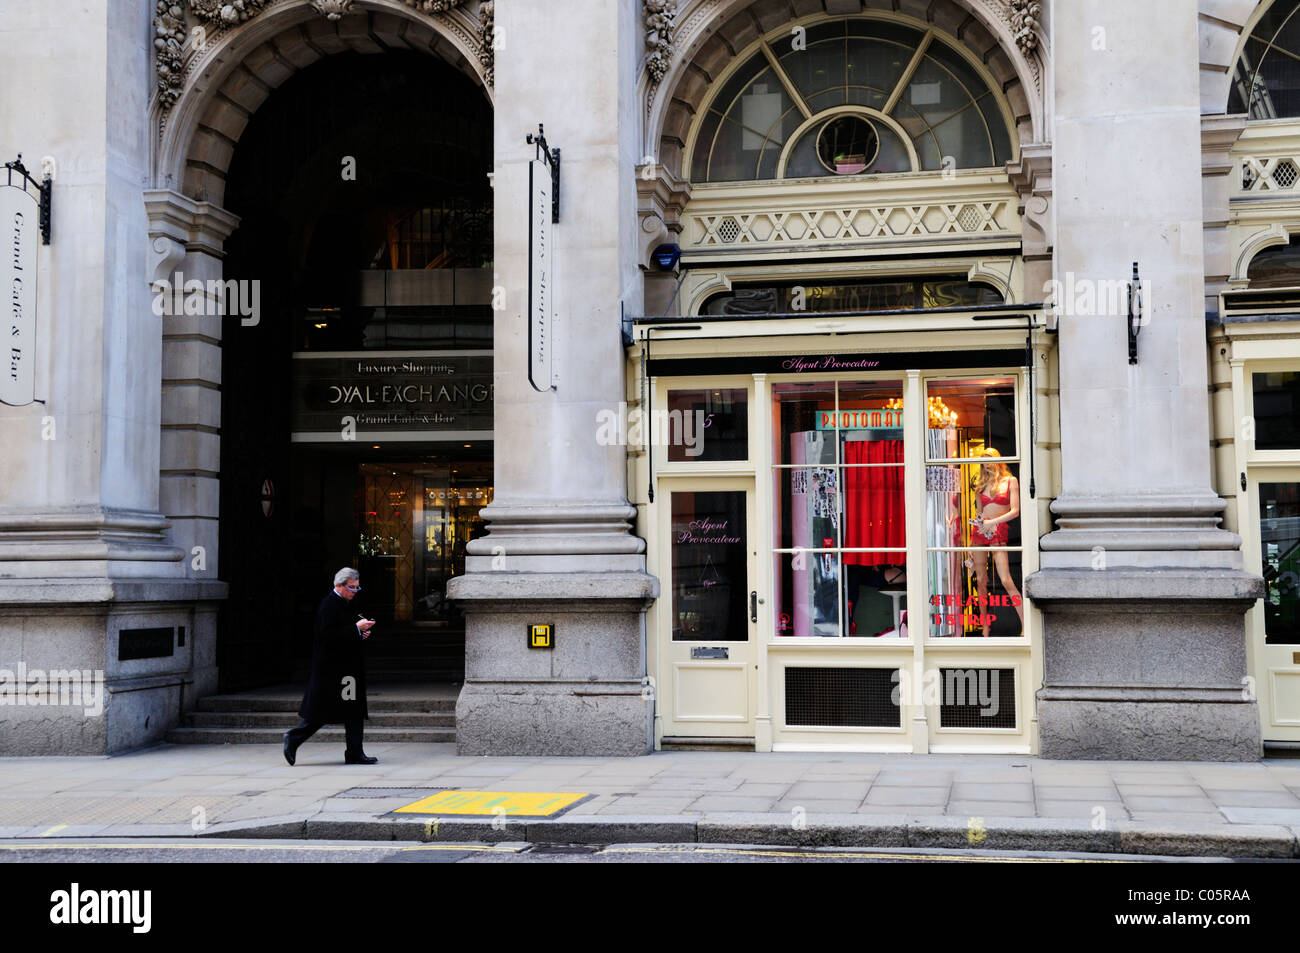 The Royal Exchange Luxury Shops, Cornhill, London, England, UK - Stock Image